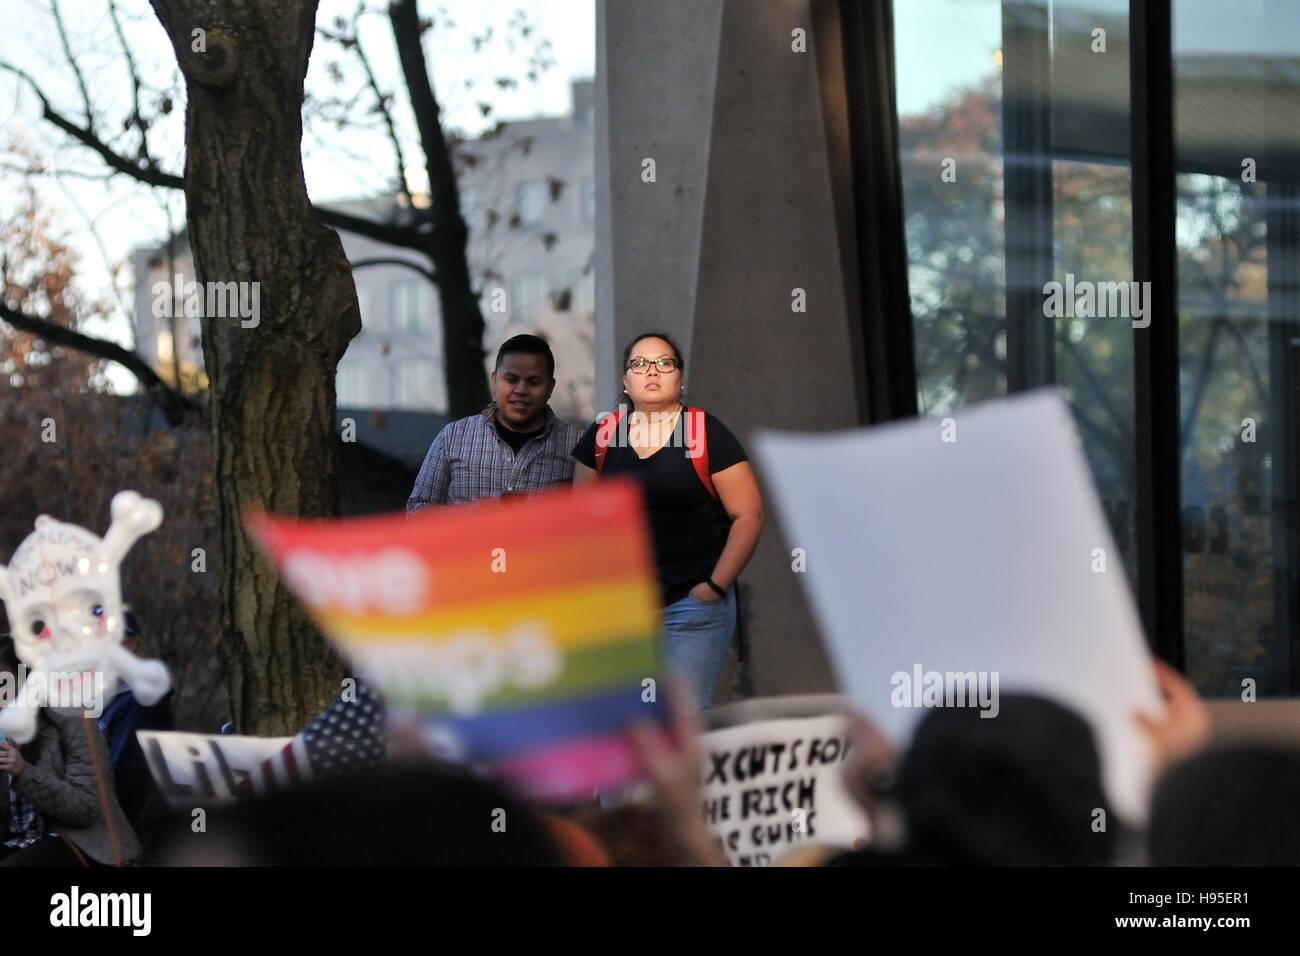 Philadelphia, Pennsylvania, USA. 19th November, 2016. Onlookers near Independence Mall in Center City, Philadelphia, - Stock Image